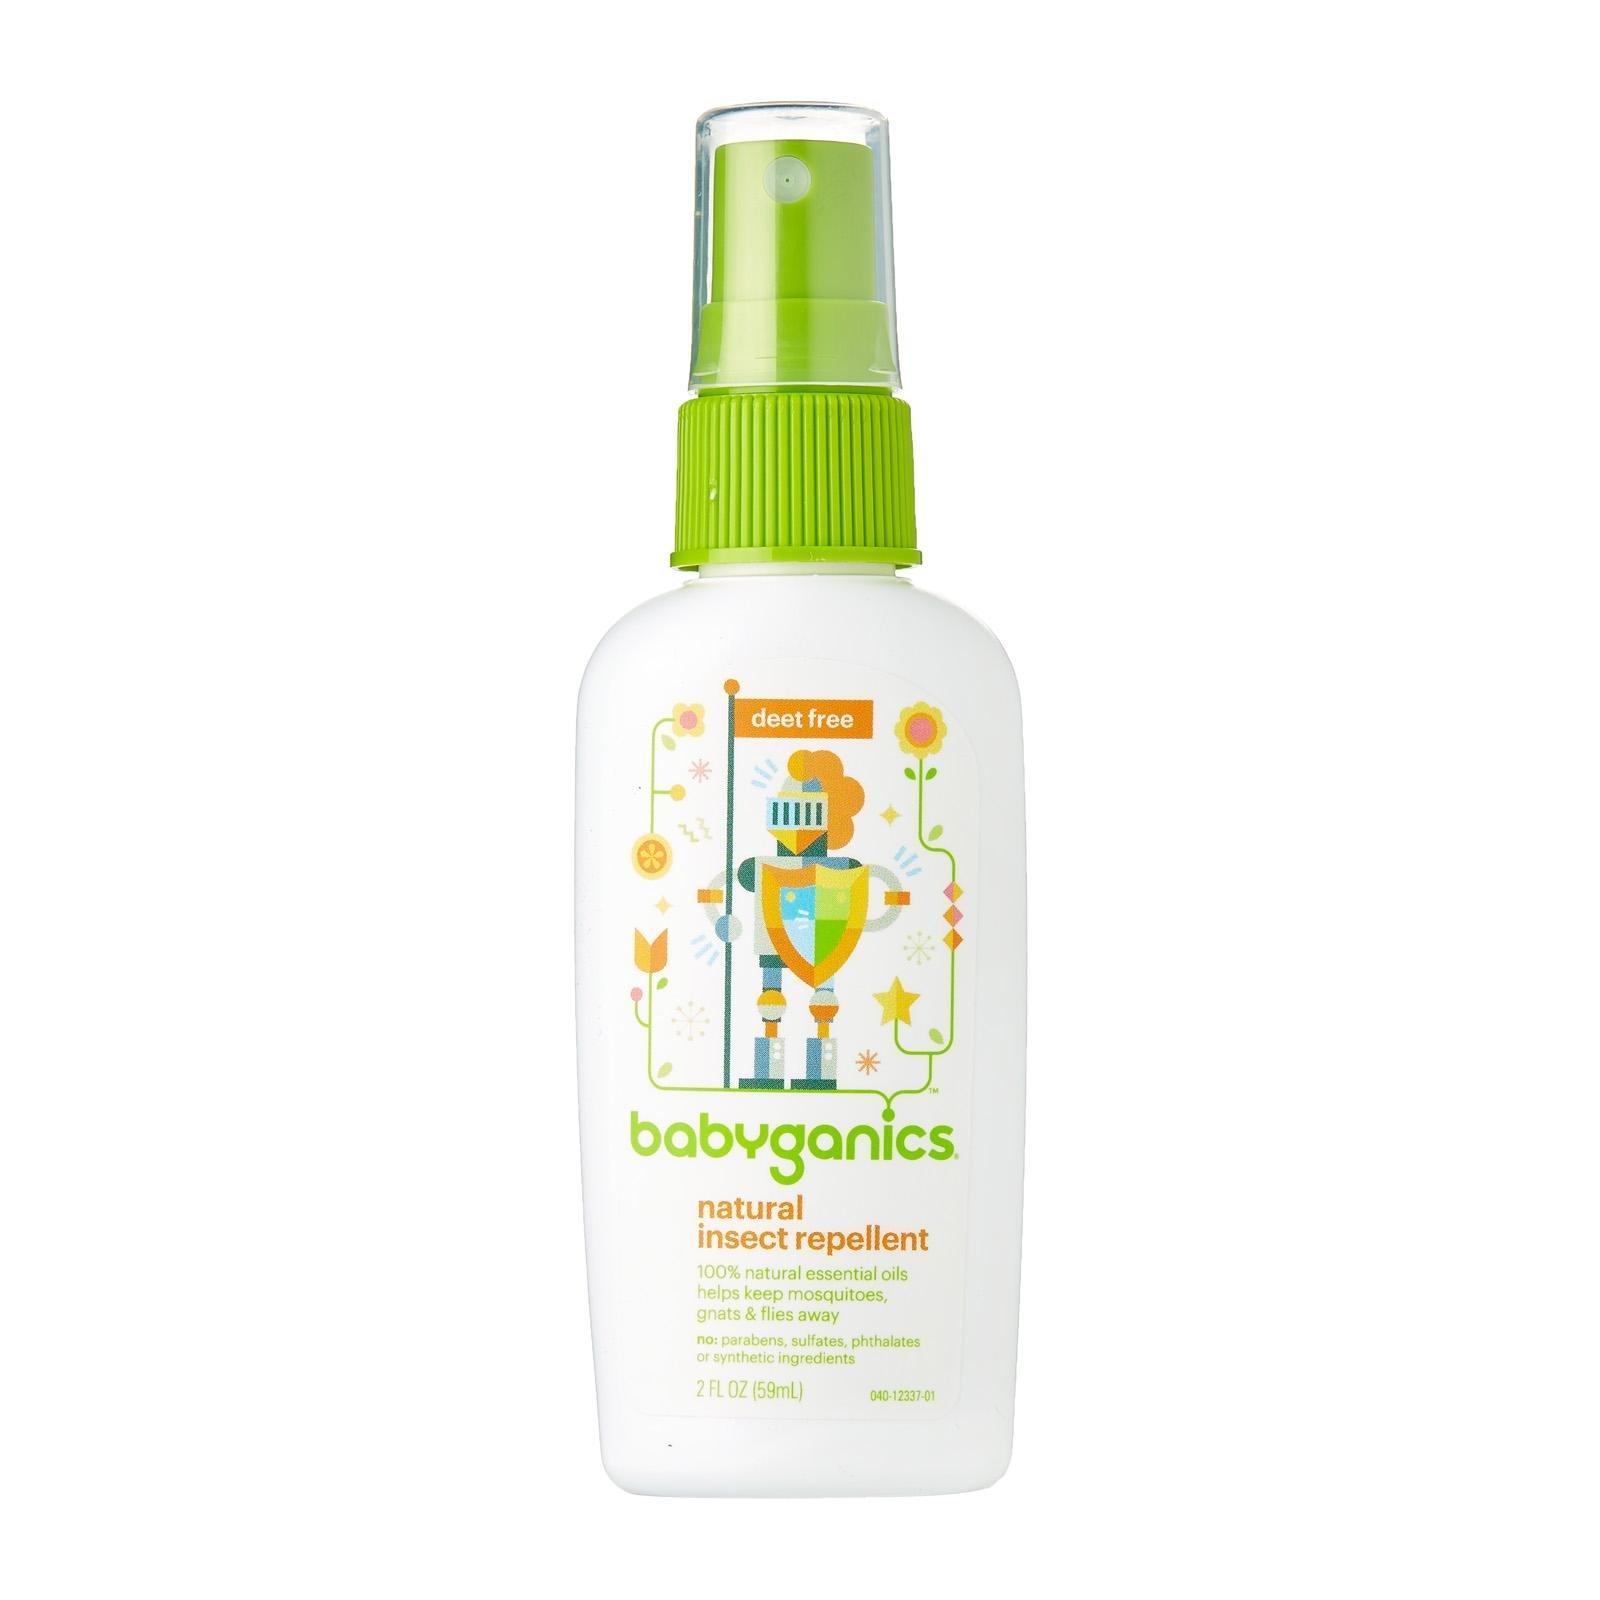 Babyganics Travel Size Bug Spray, 2oz, Packaging May Vary